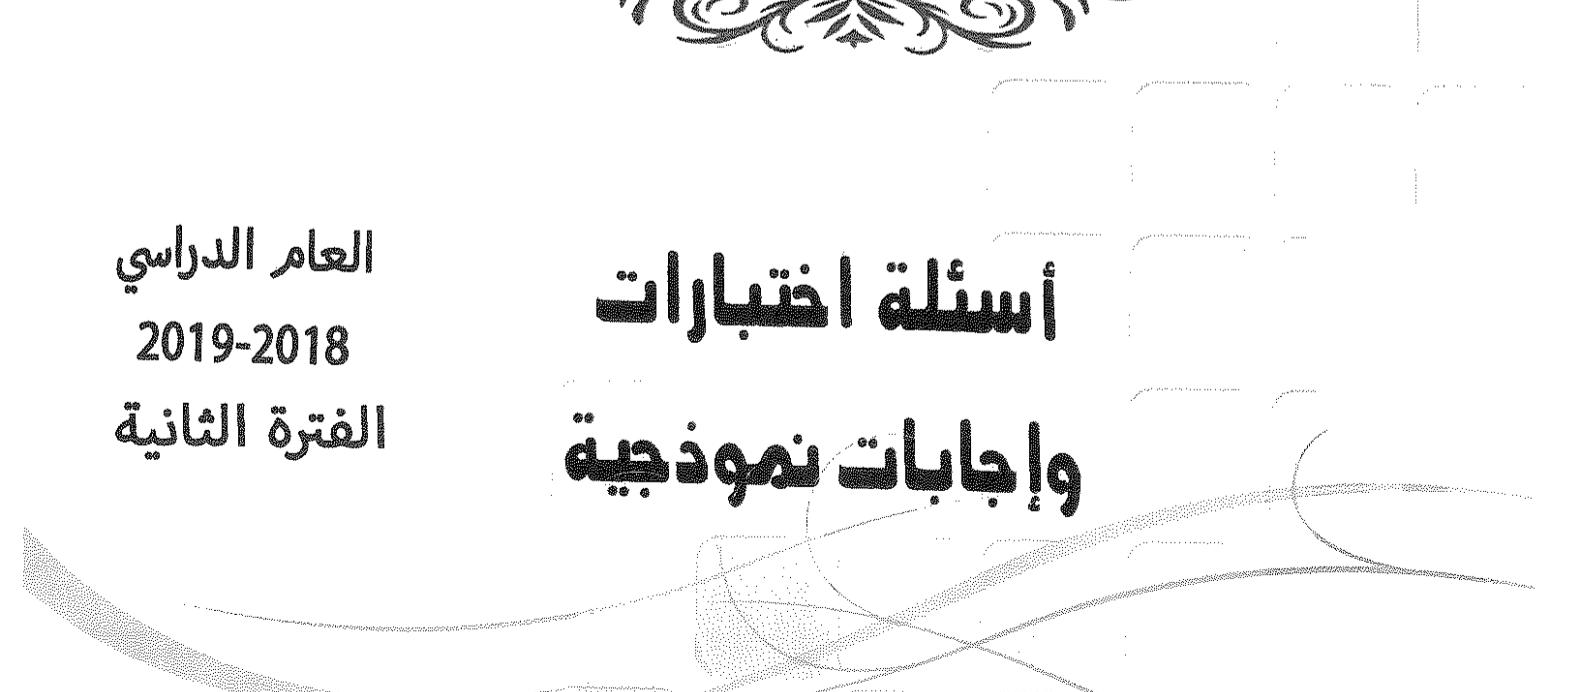 سلمان الفارسي